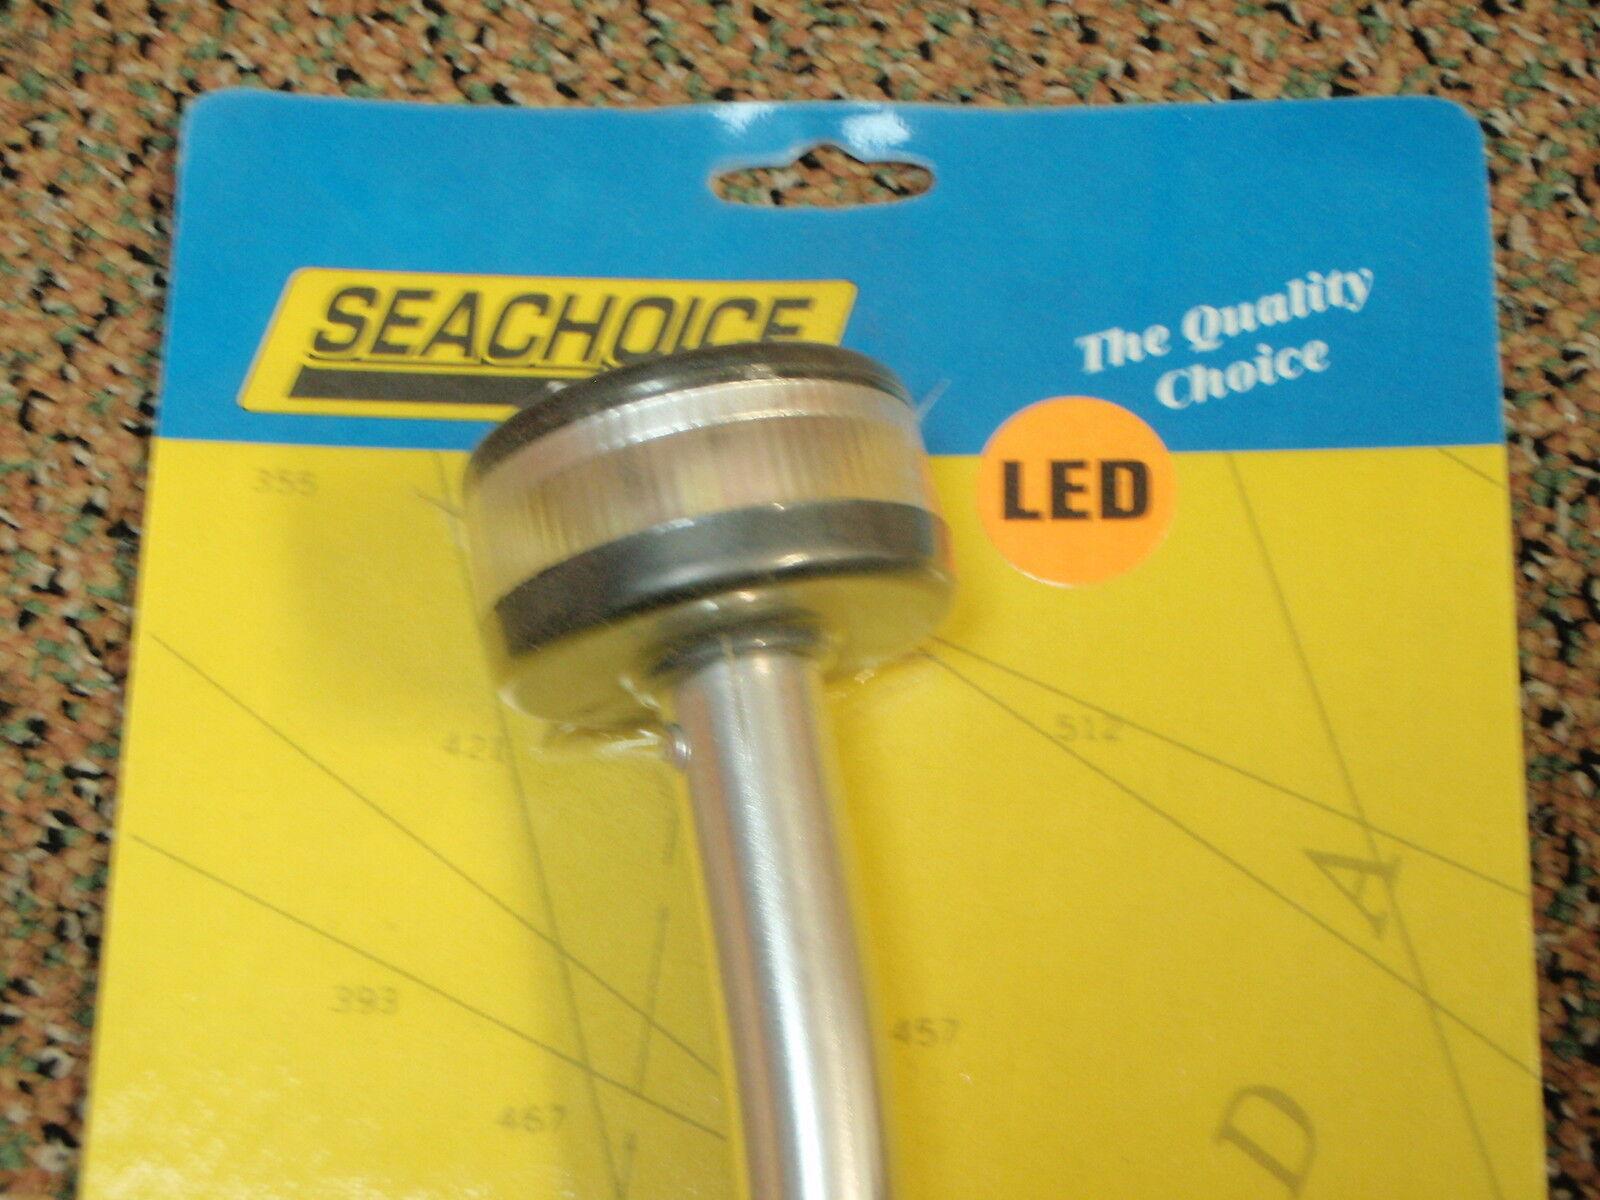 "LED POLE LIGHT ANCHOR ALL-AROUND SEACHOICE 50 02901 ALUMINUM TUBE 24/"" STERN BOAT"